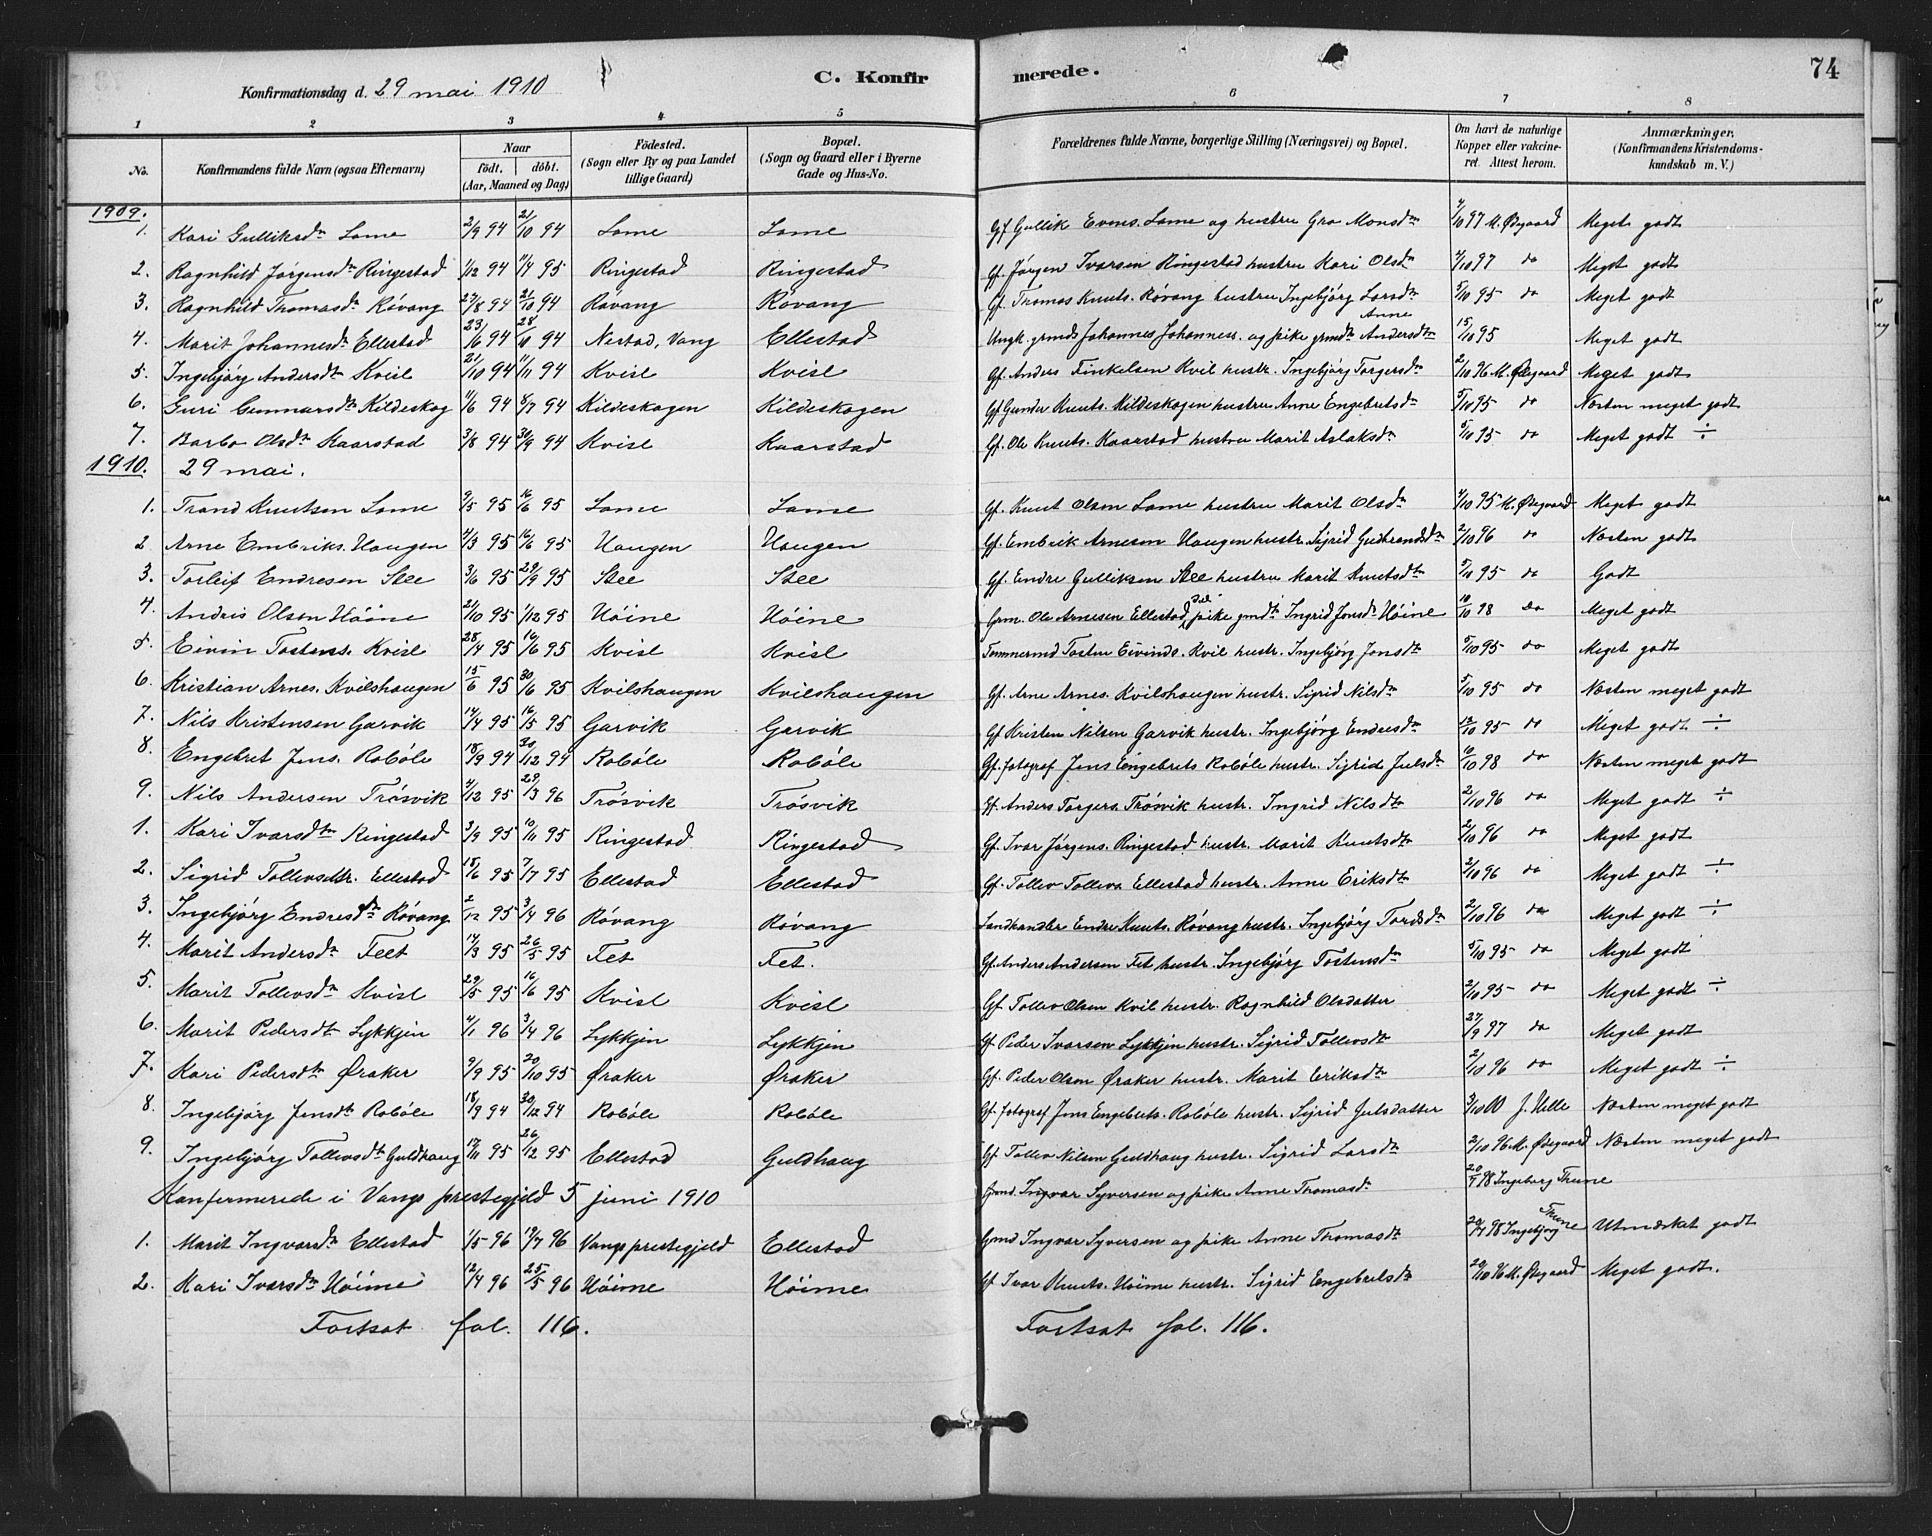 SAH, Vestre Slidre prestekontor, Klokkerbok nr. 6, 1881-1915, s. 74